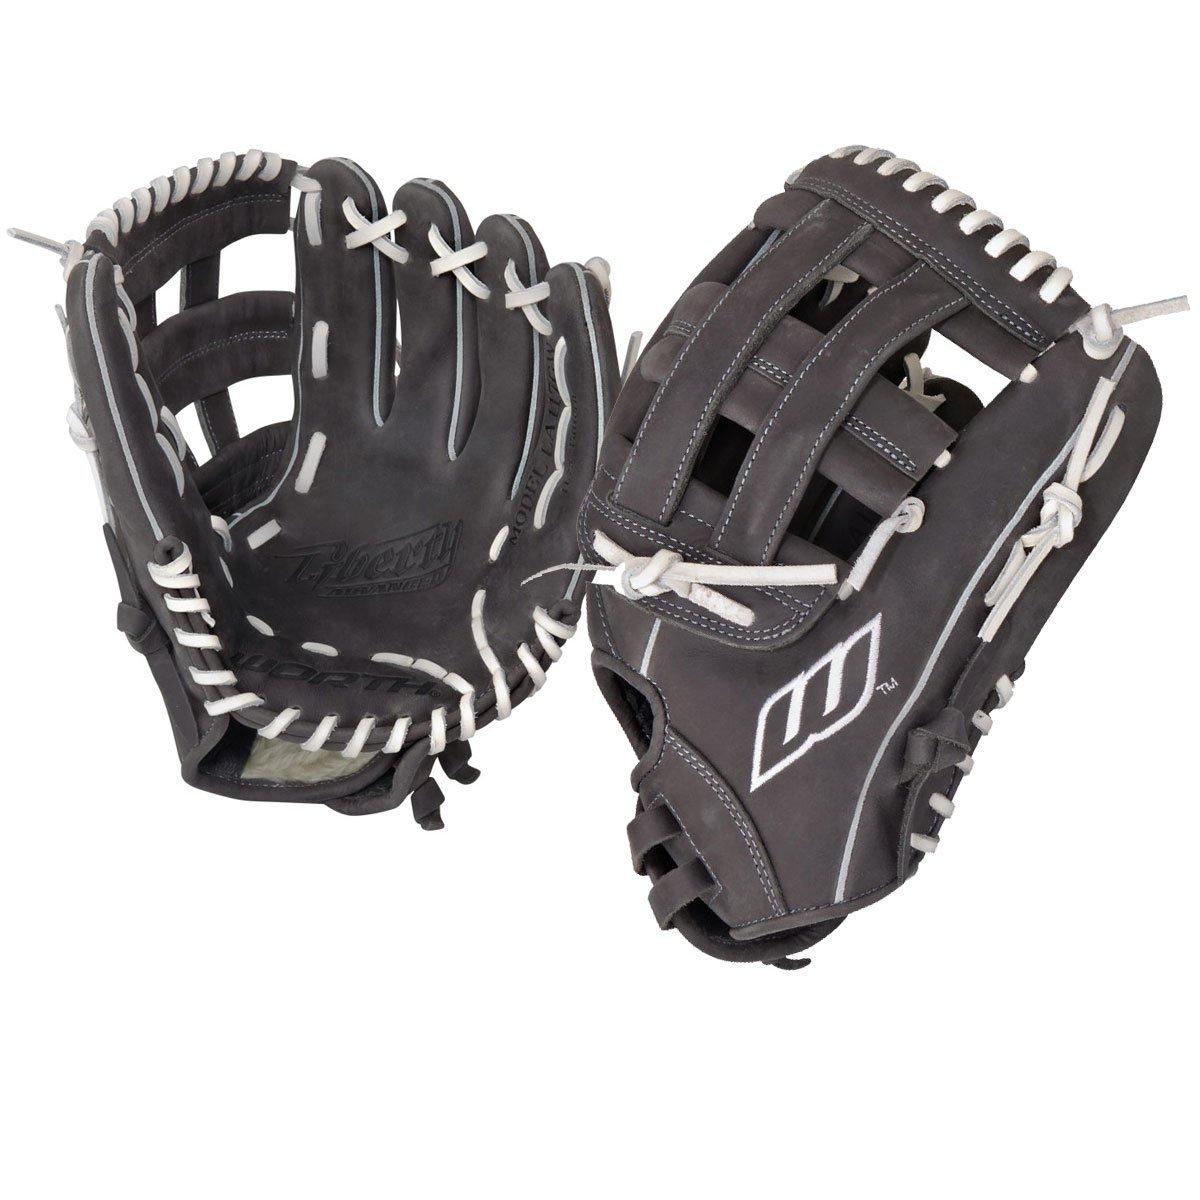 worth-liberty-advanced-11-75-inch-la117gw-fastpitch-softball-glove-right-hand-throw LA117GW-Right Hand Throw Worth 043365345805 The updated design of the Liberty Advanced Series puts a new